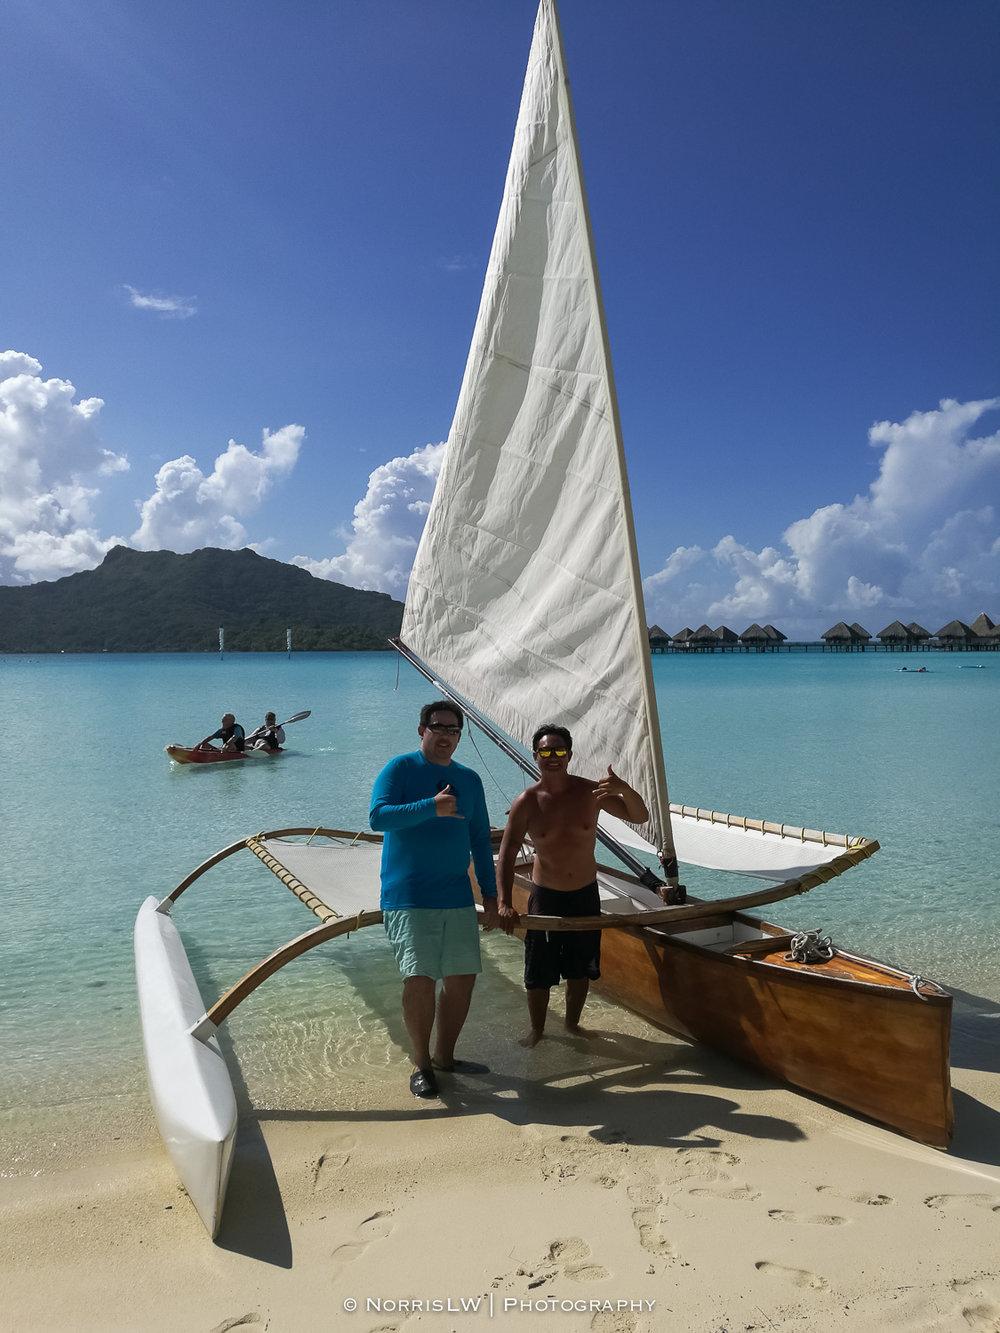 NorrisLWPhotography_Tahiti_BoraBora-20180124-118.jpg